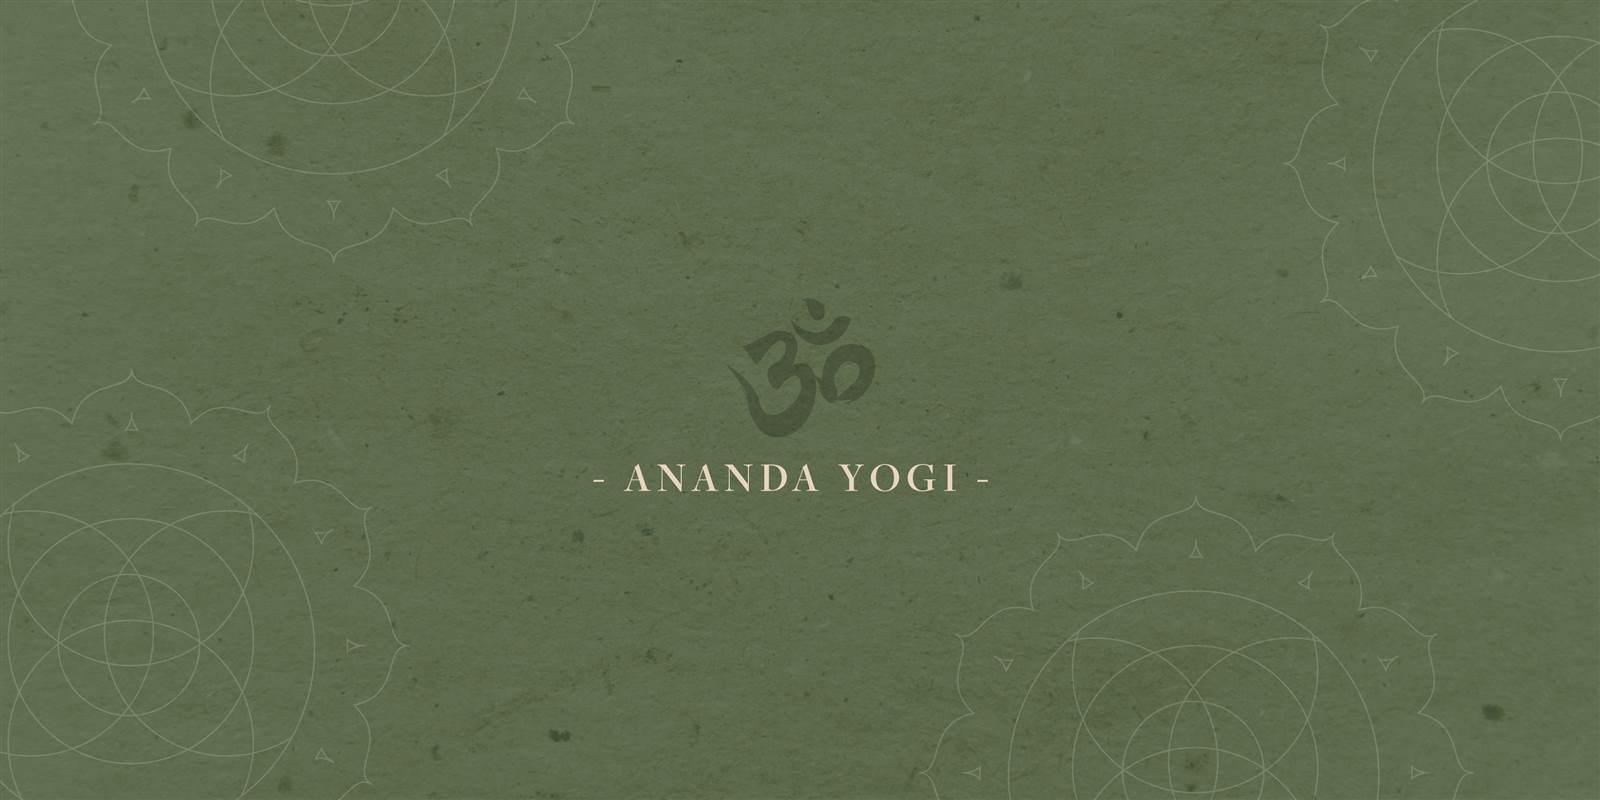 Ananda web banner yogi